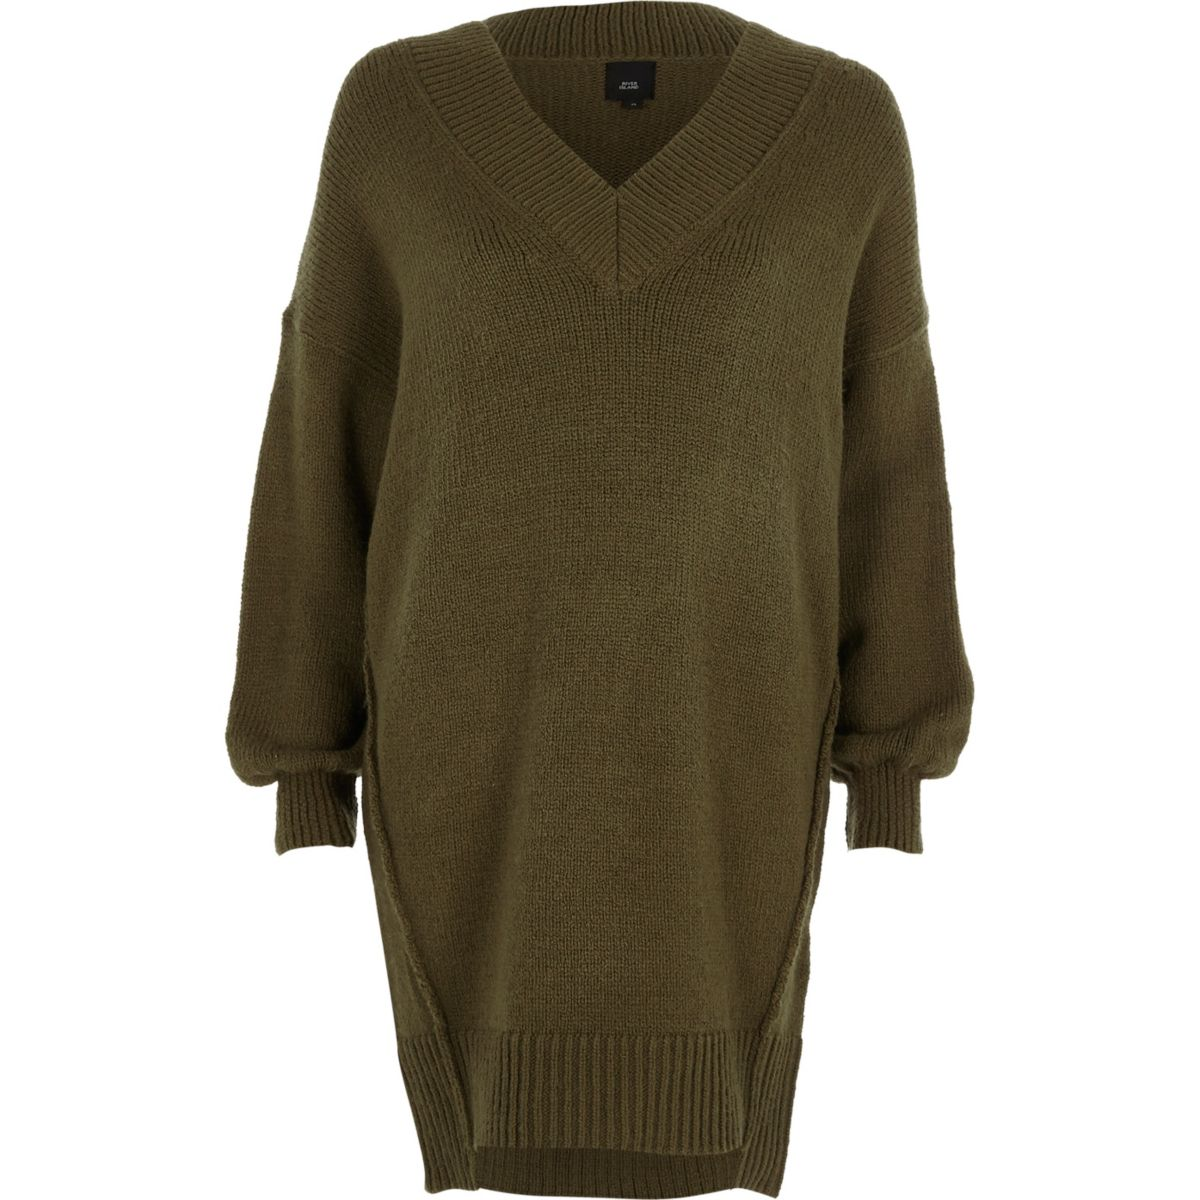 Khaki green V neck sweater dress